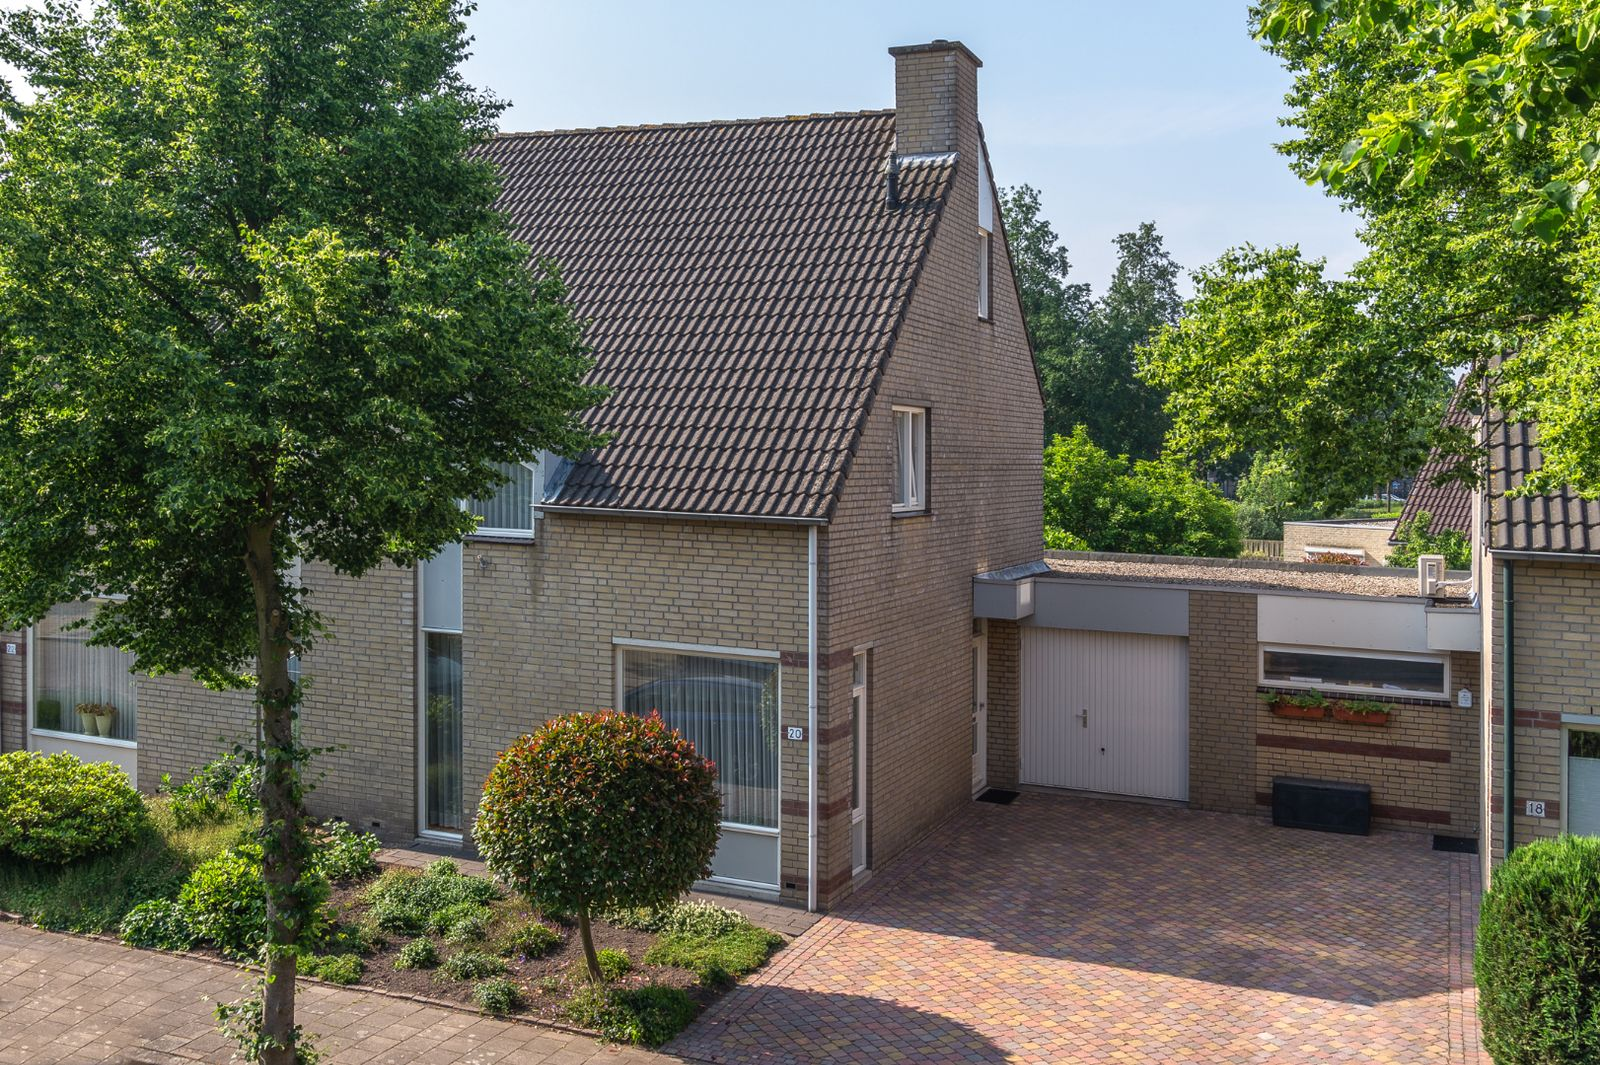 Johan Termeulenstraat 20, Venlo